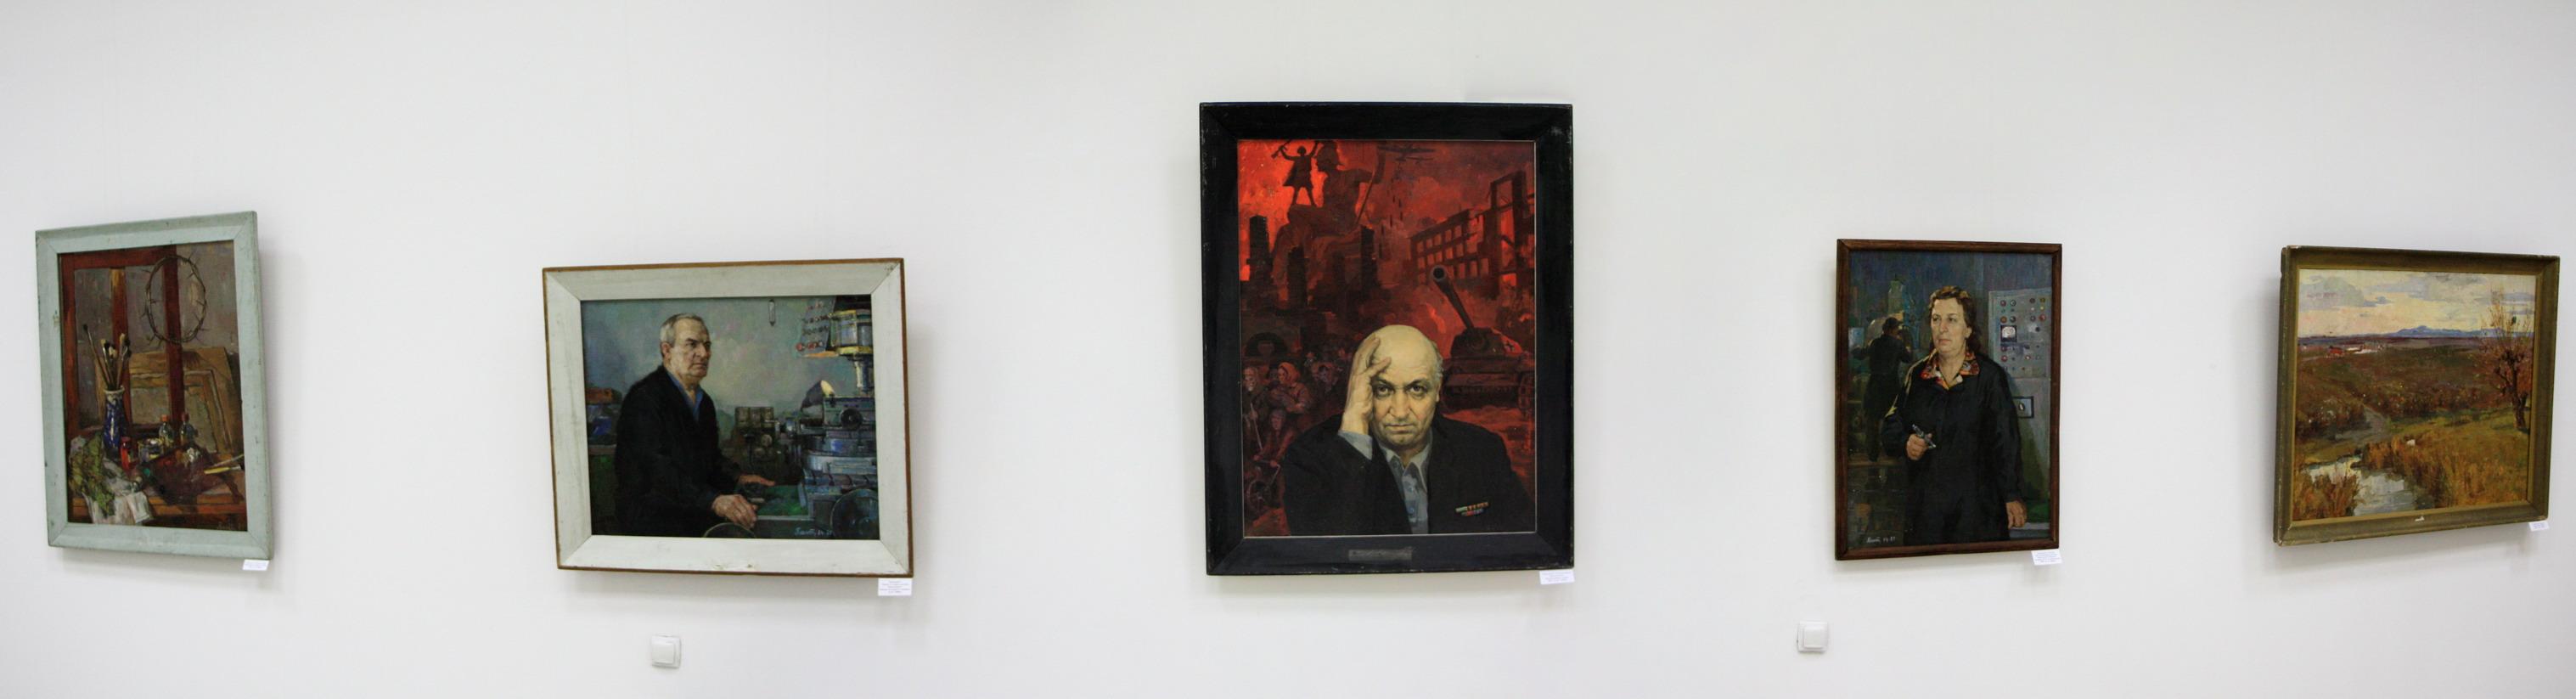 Пантюхин Павел, Экспозиция.